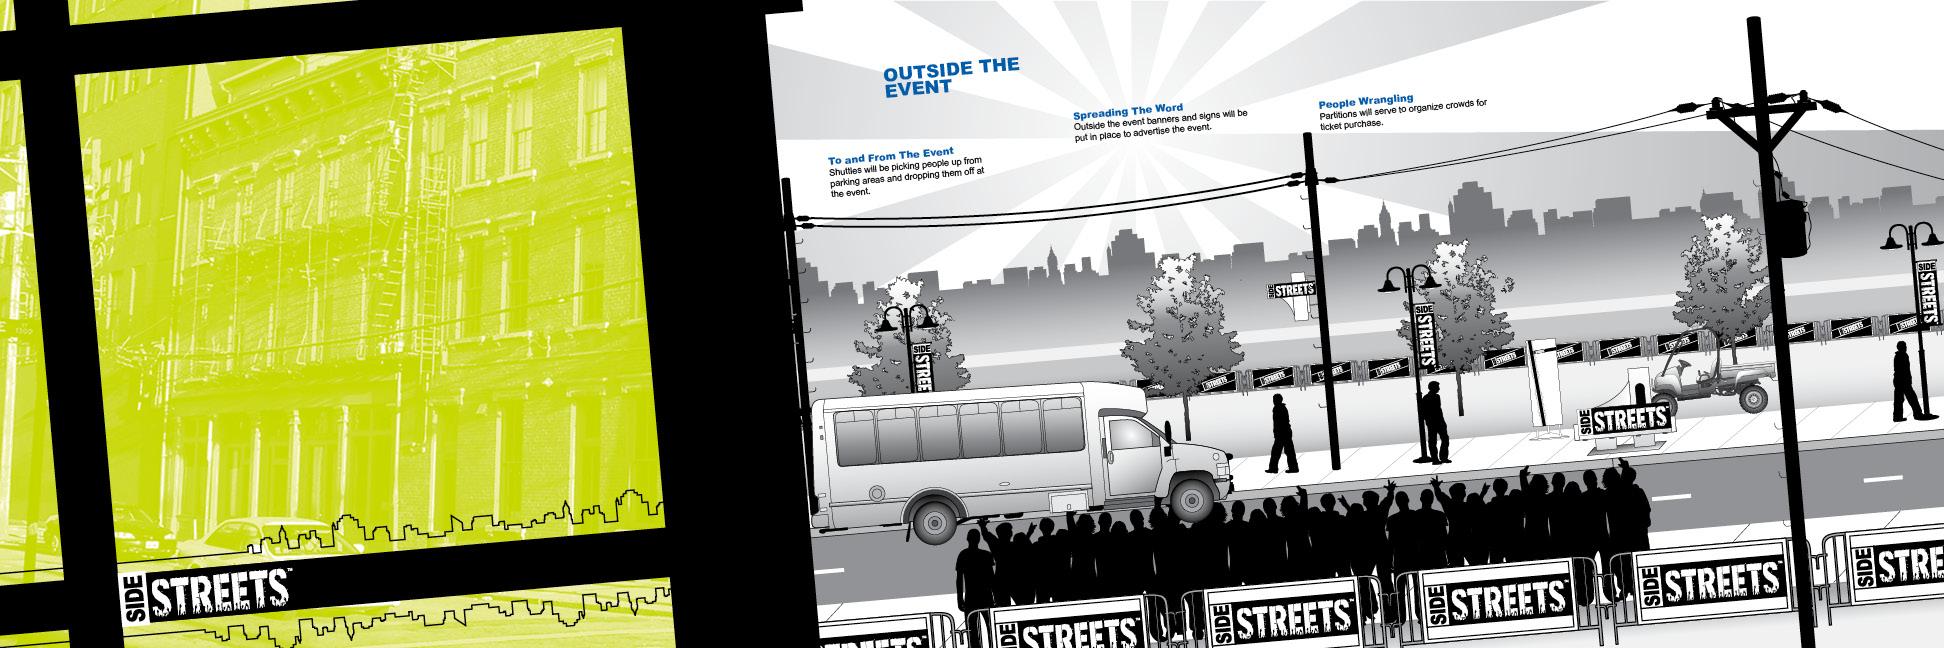 Sidestreets Brand Identity Manuel Final [Revised]33.jpg